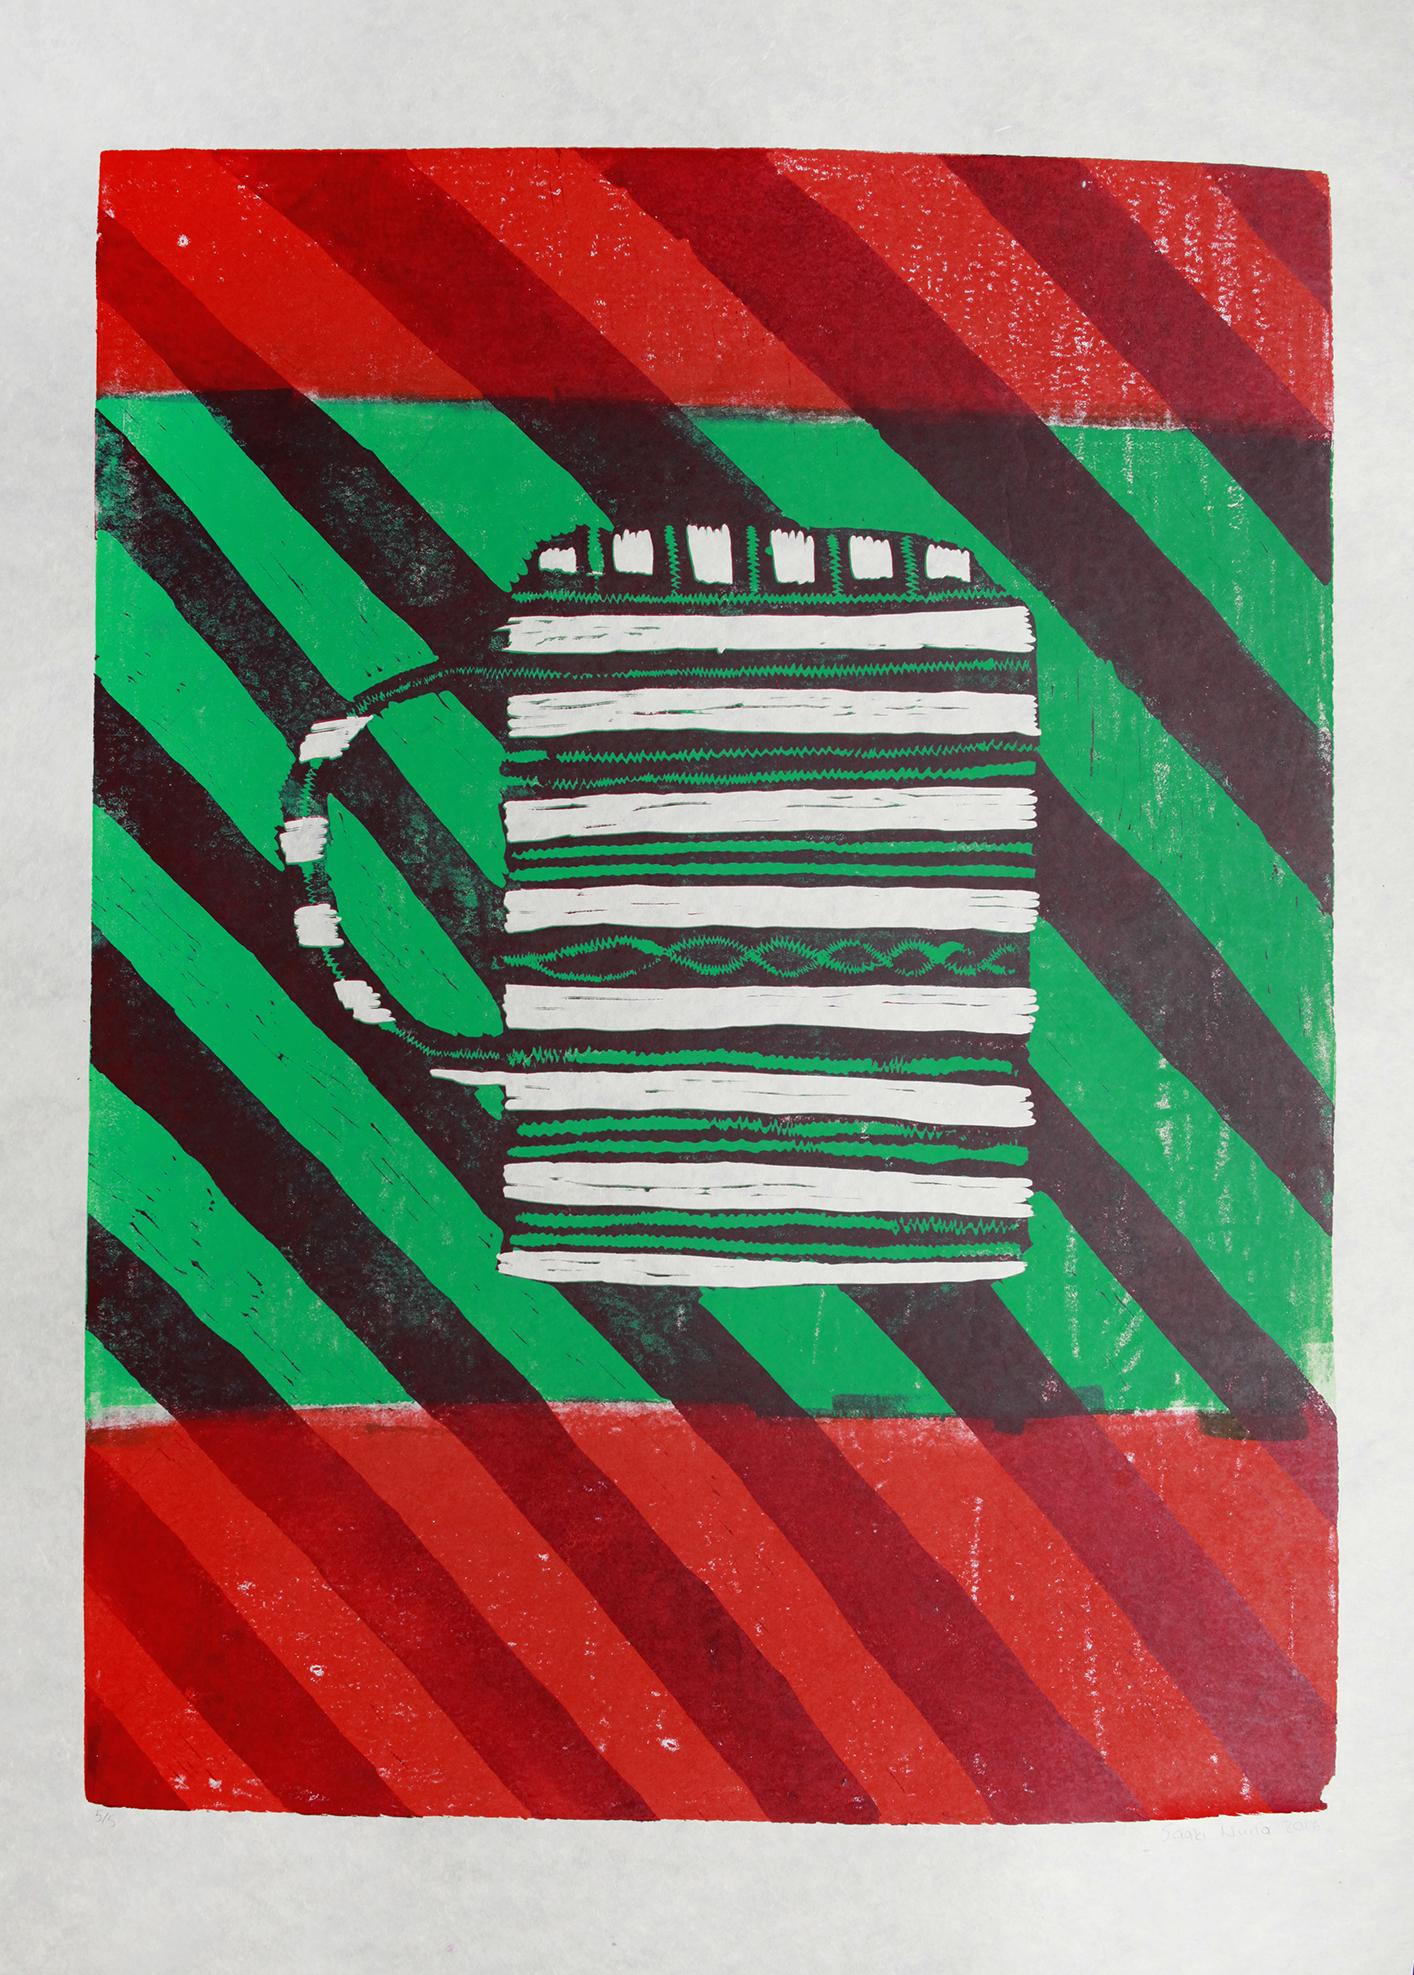 "Achoo   Saaki Nuna  Two-Layer Linocut Print on Washi  21.5 x 31"""